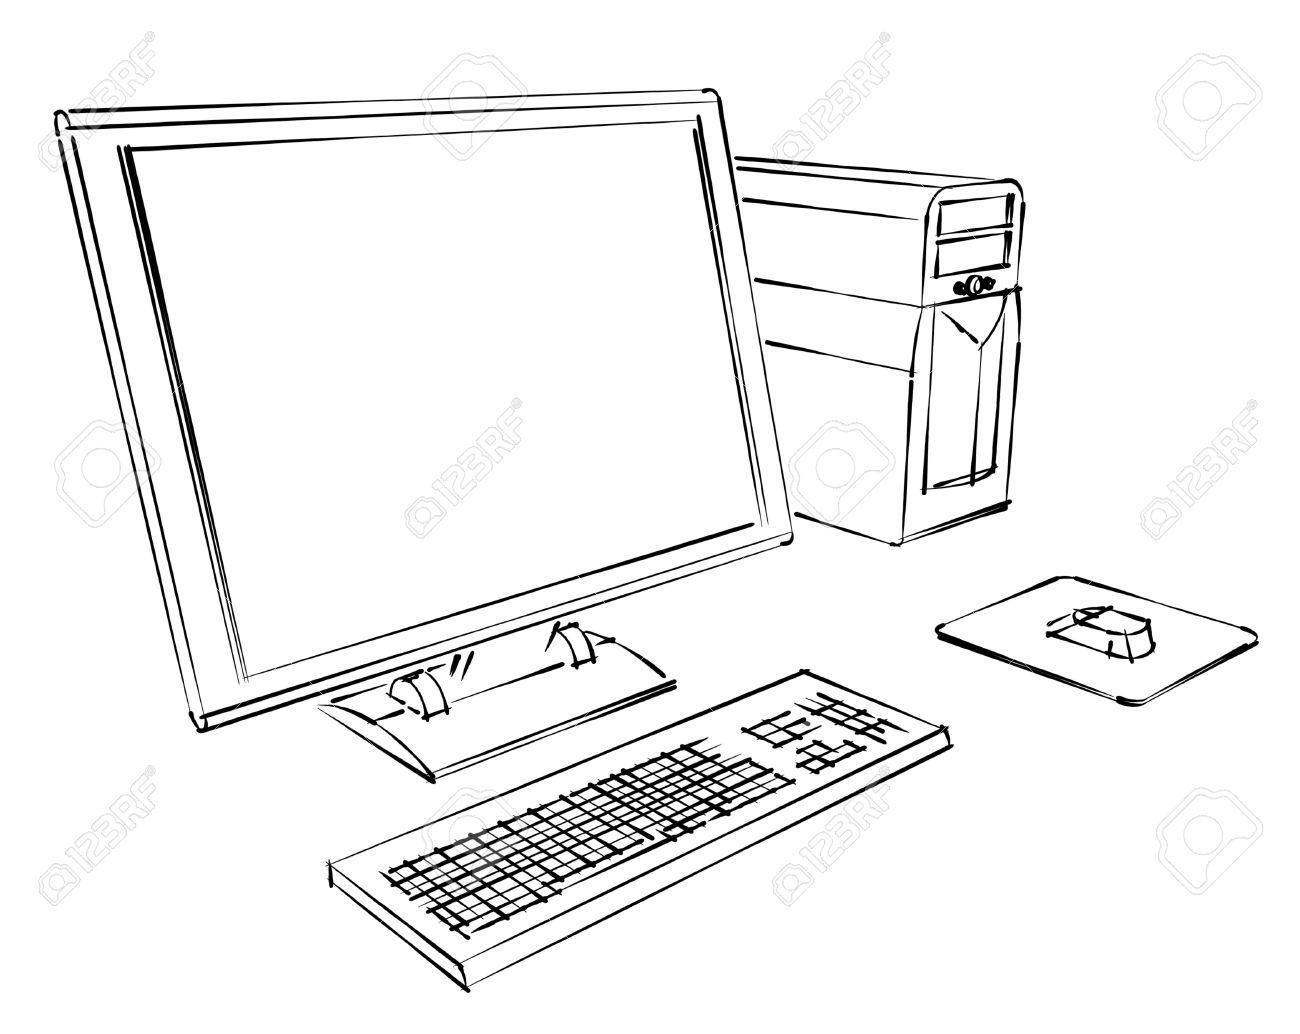 Old Ibm Computers